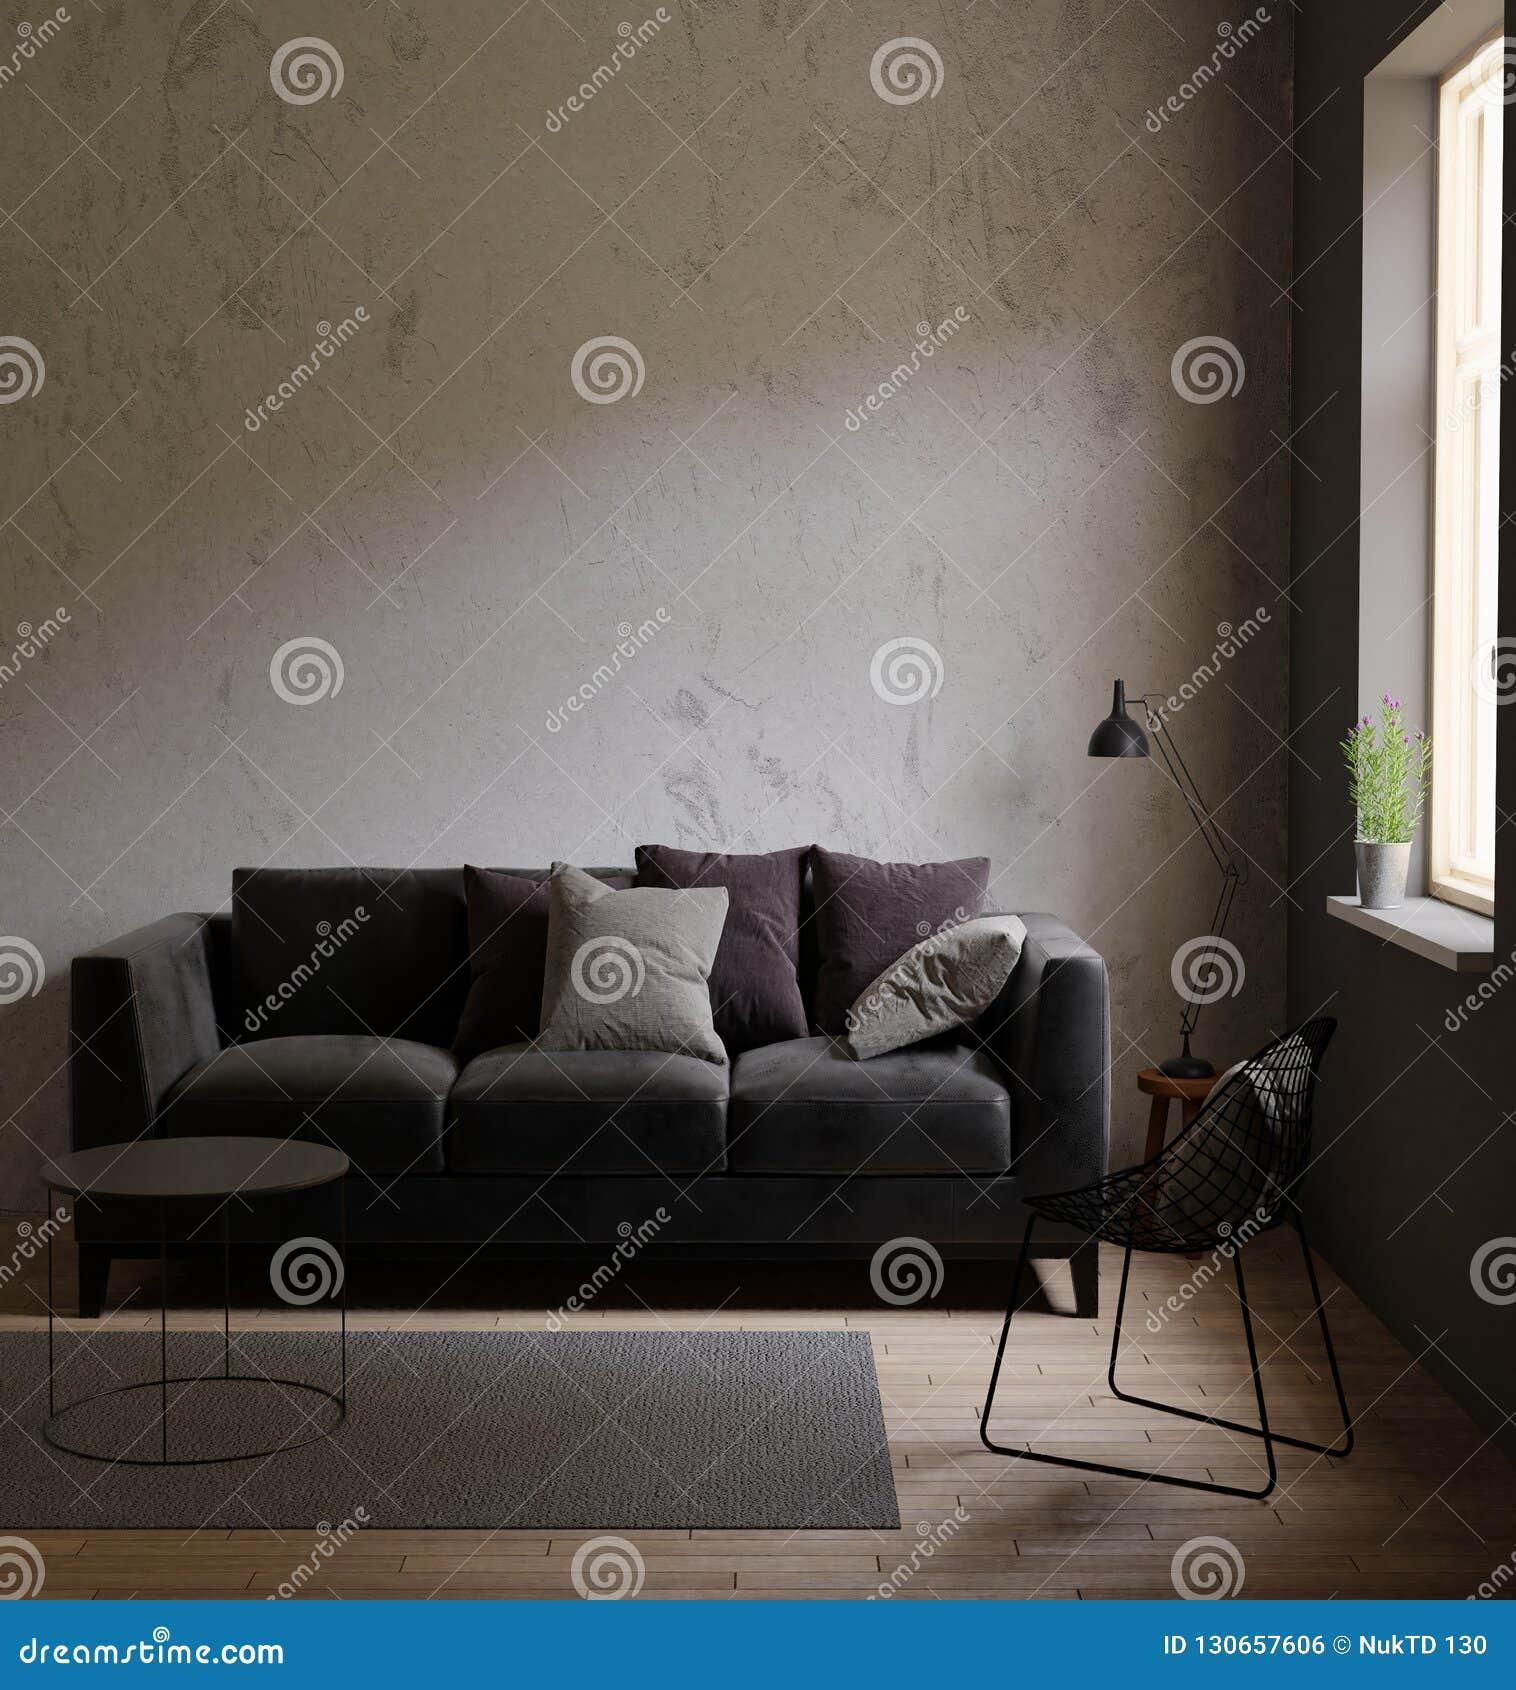 Superb Gray Sofa In A Dark Room The Bright Light From Eternal Light Machost Co Dining Chair Design Ideas Machostcouk